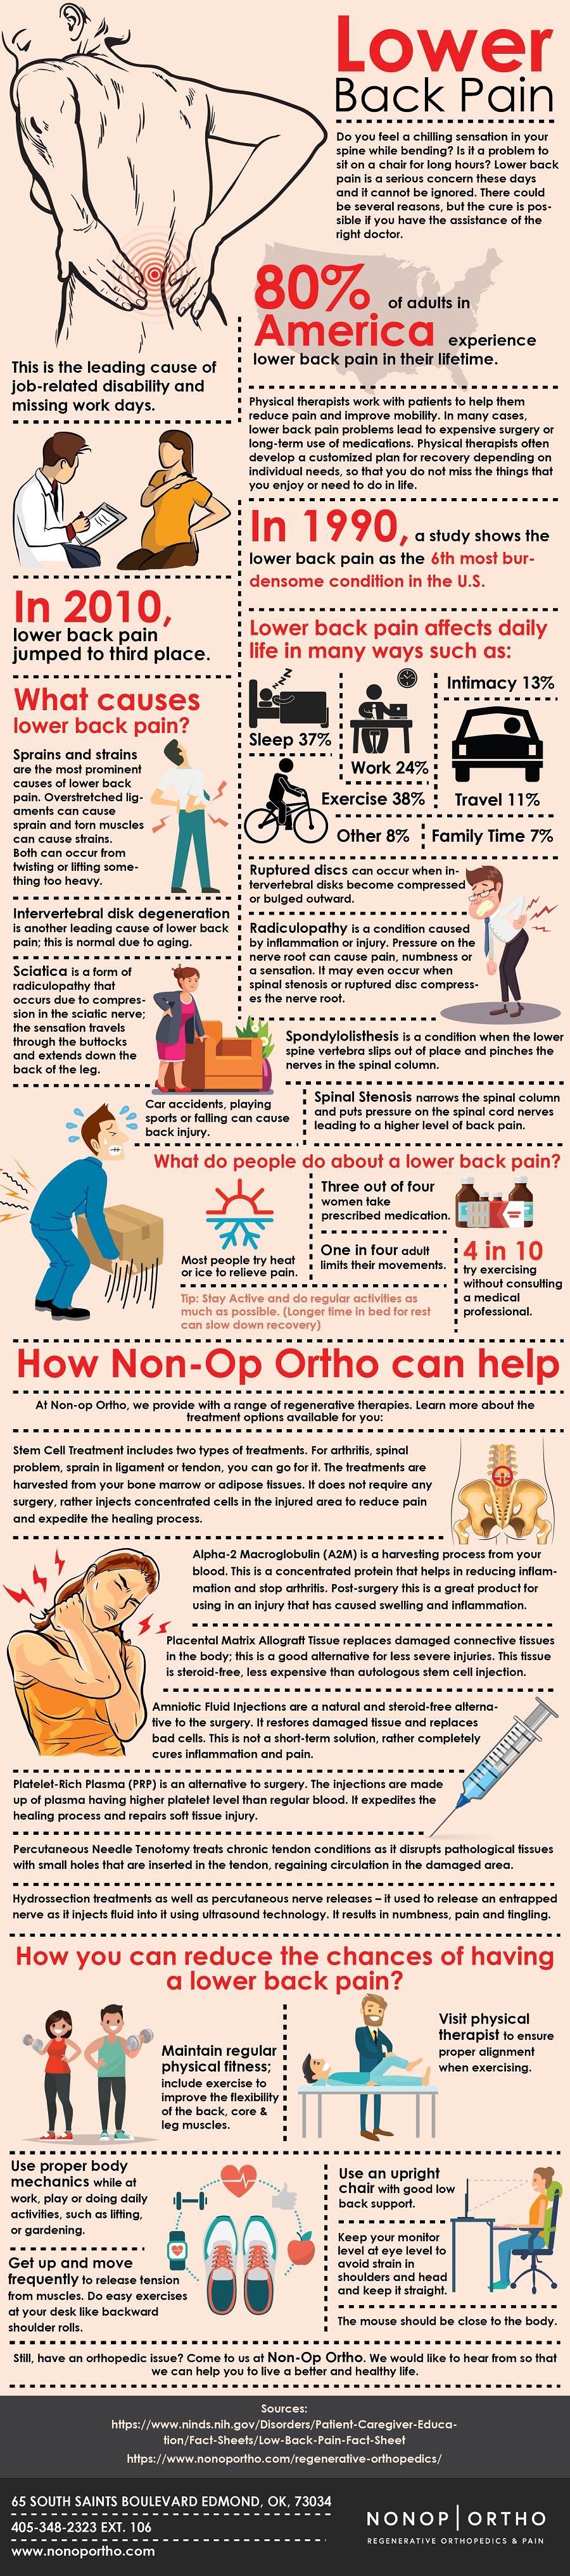 back pain okc_Non-opOrtho.jpg